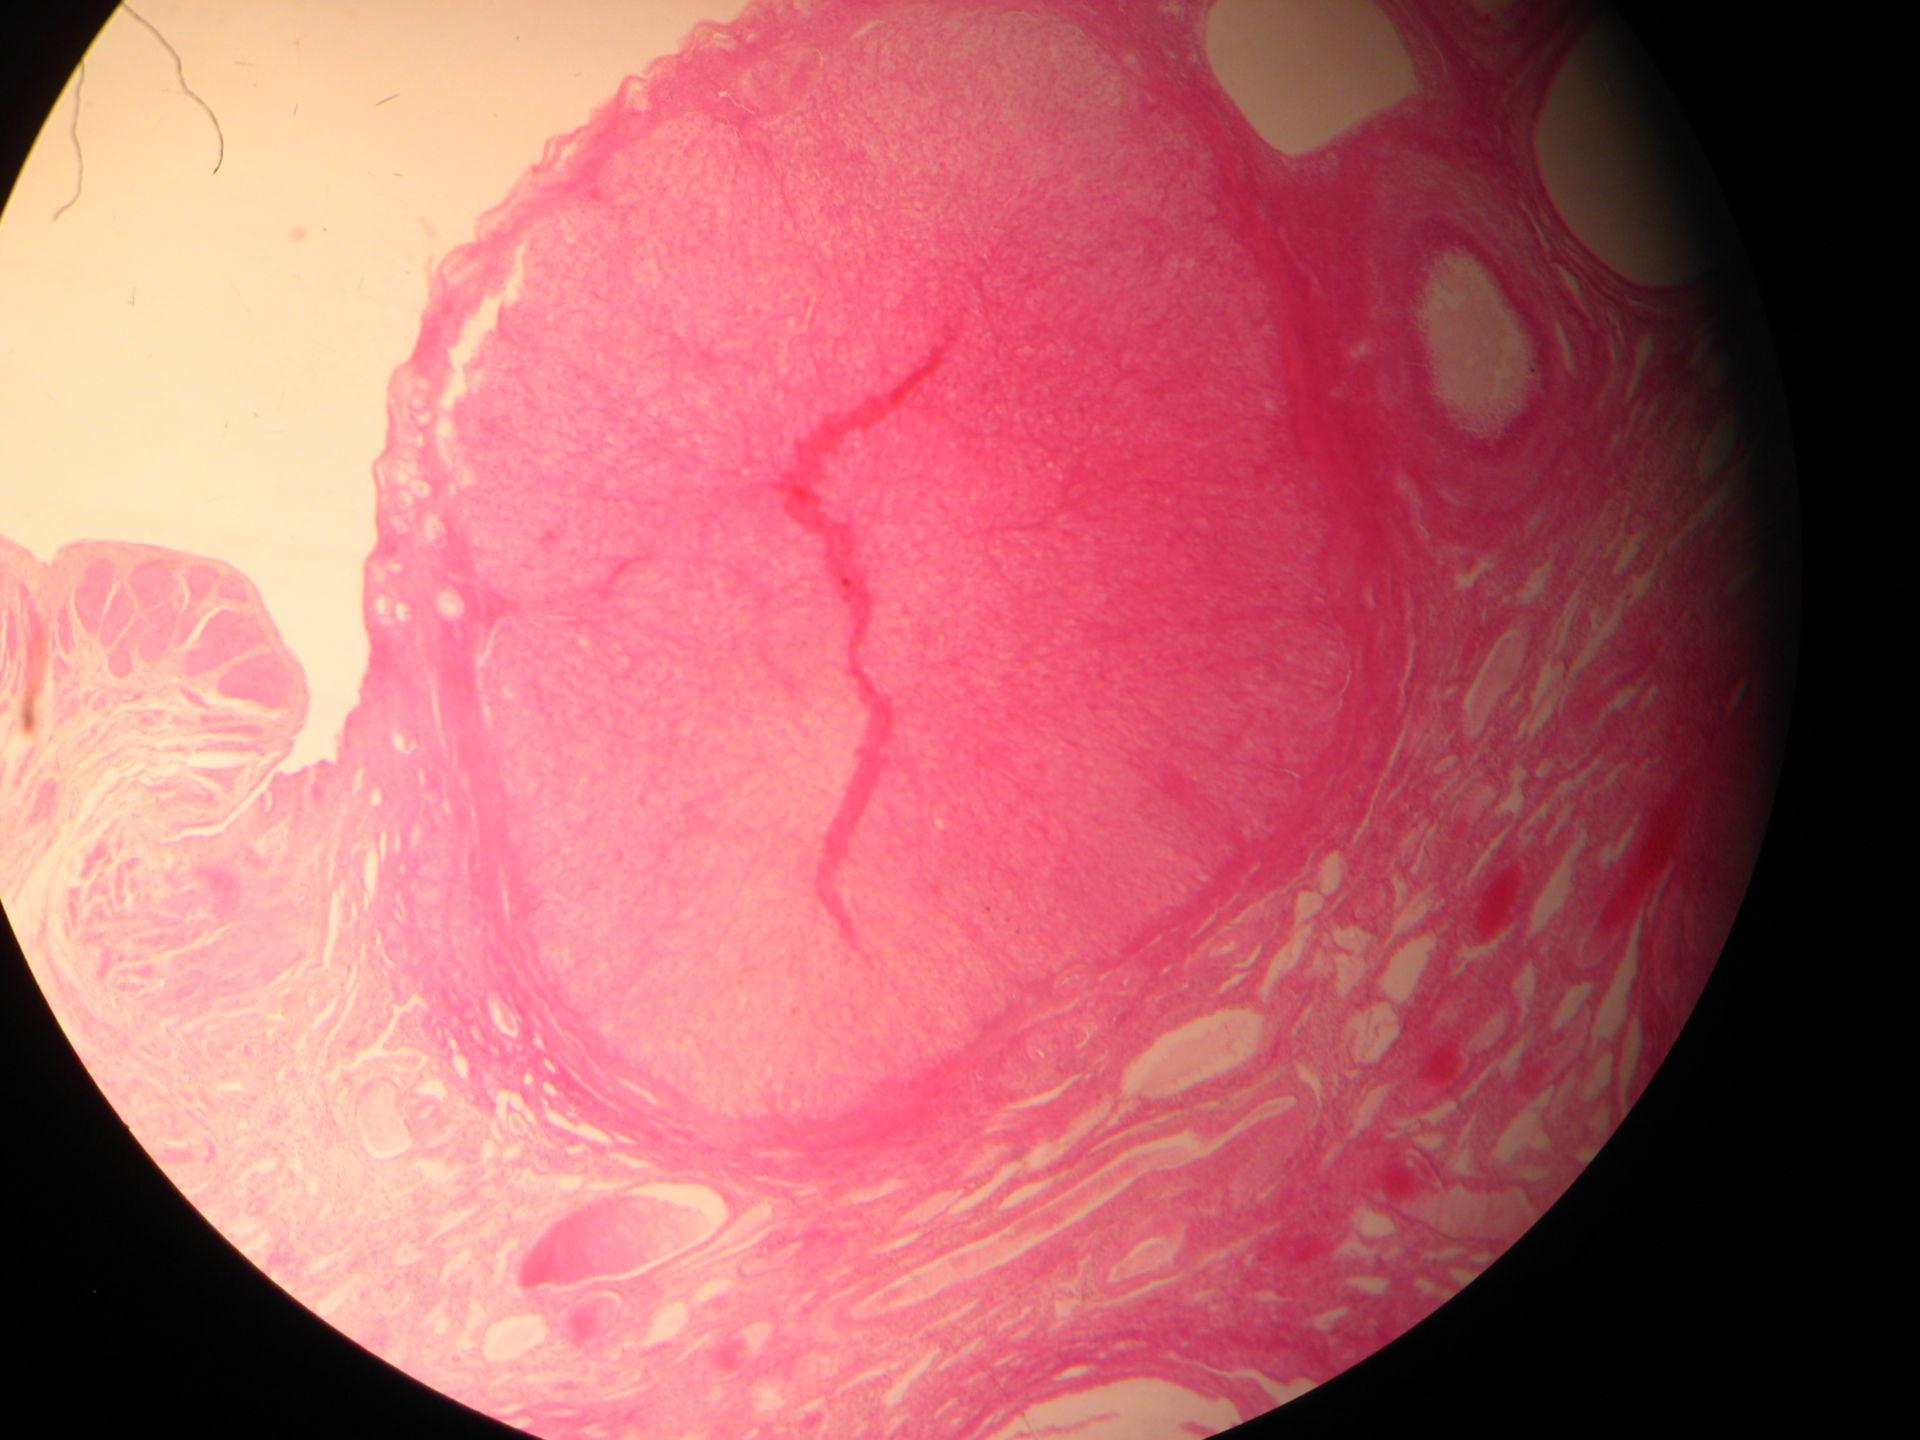 Veterinary Medicine: Ovary of a Cat (1)- Corpus luteum